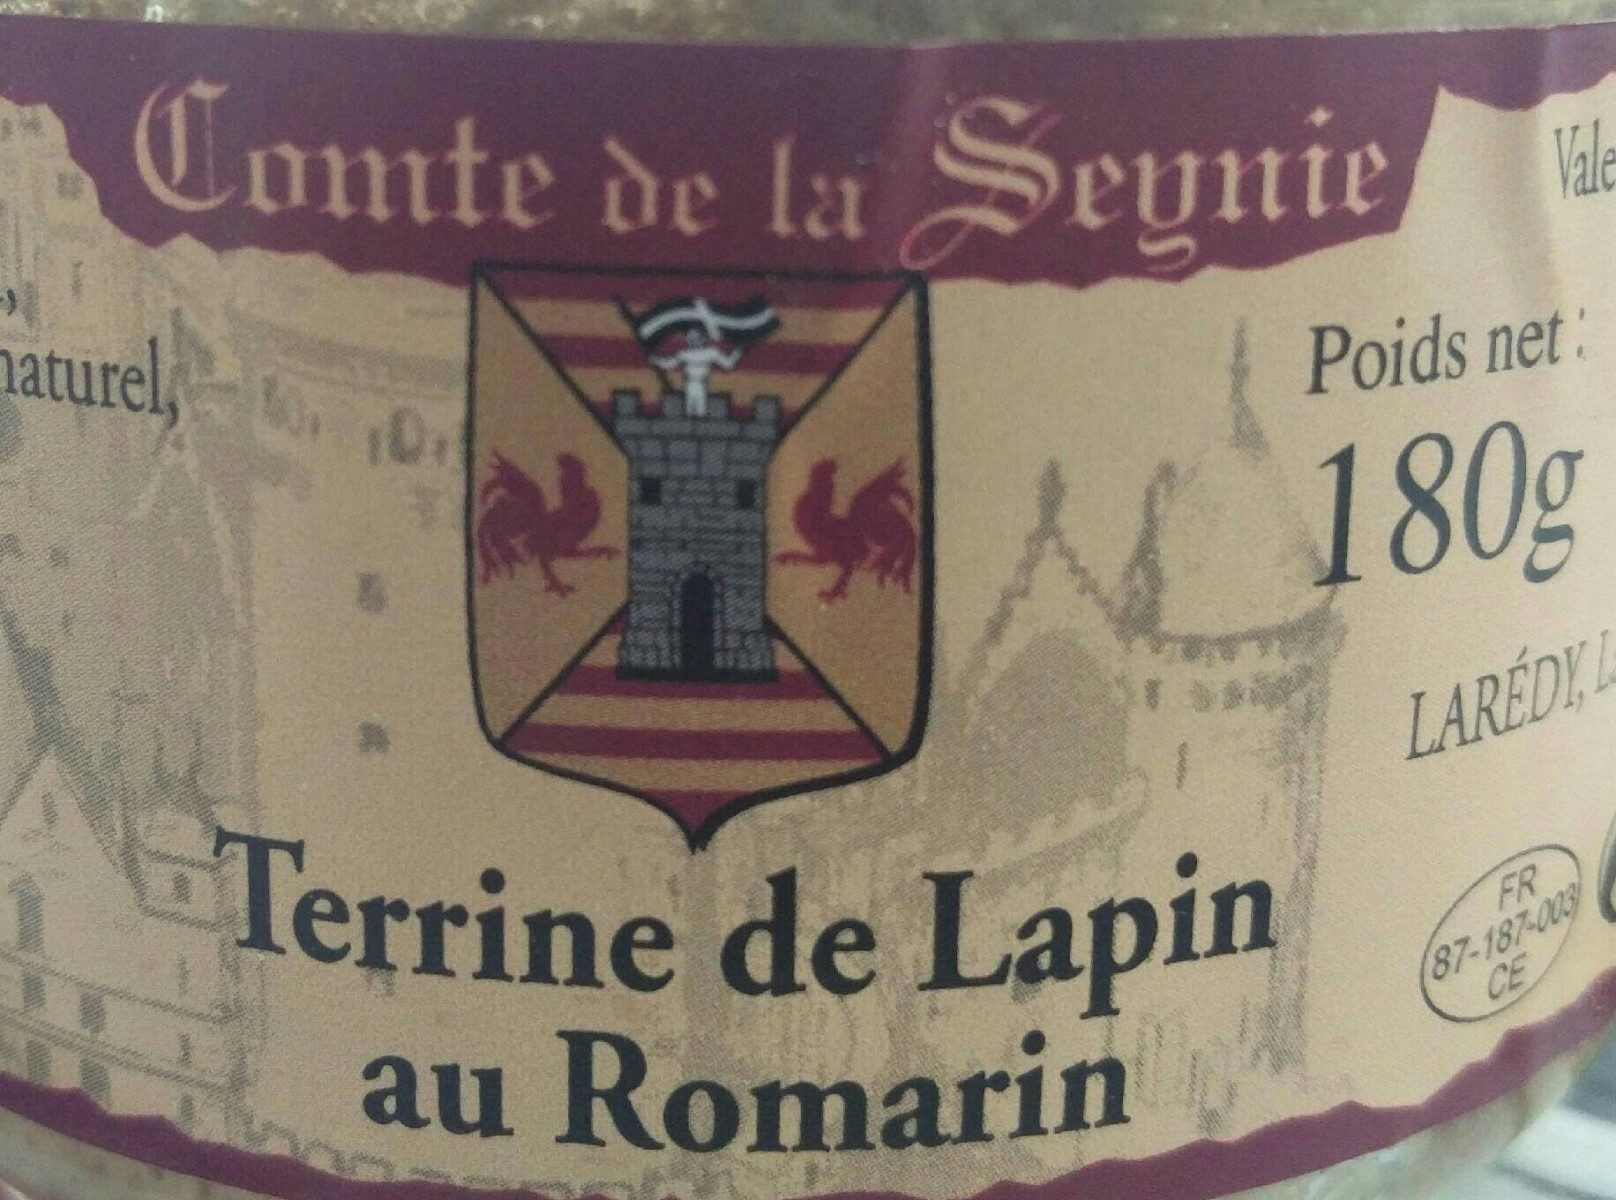 Terrine de lapin au romarin - Product - fr